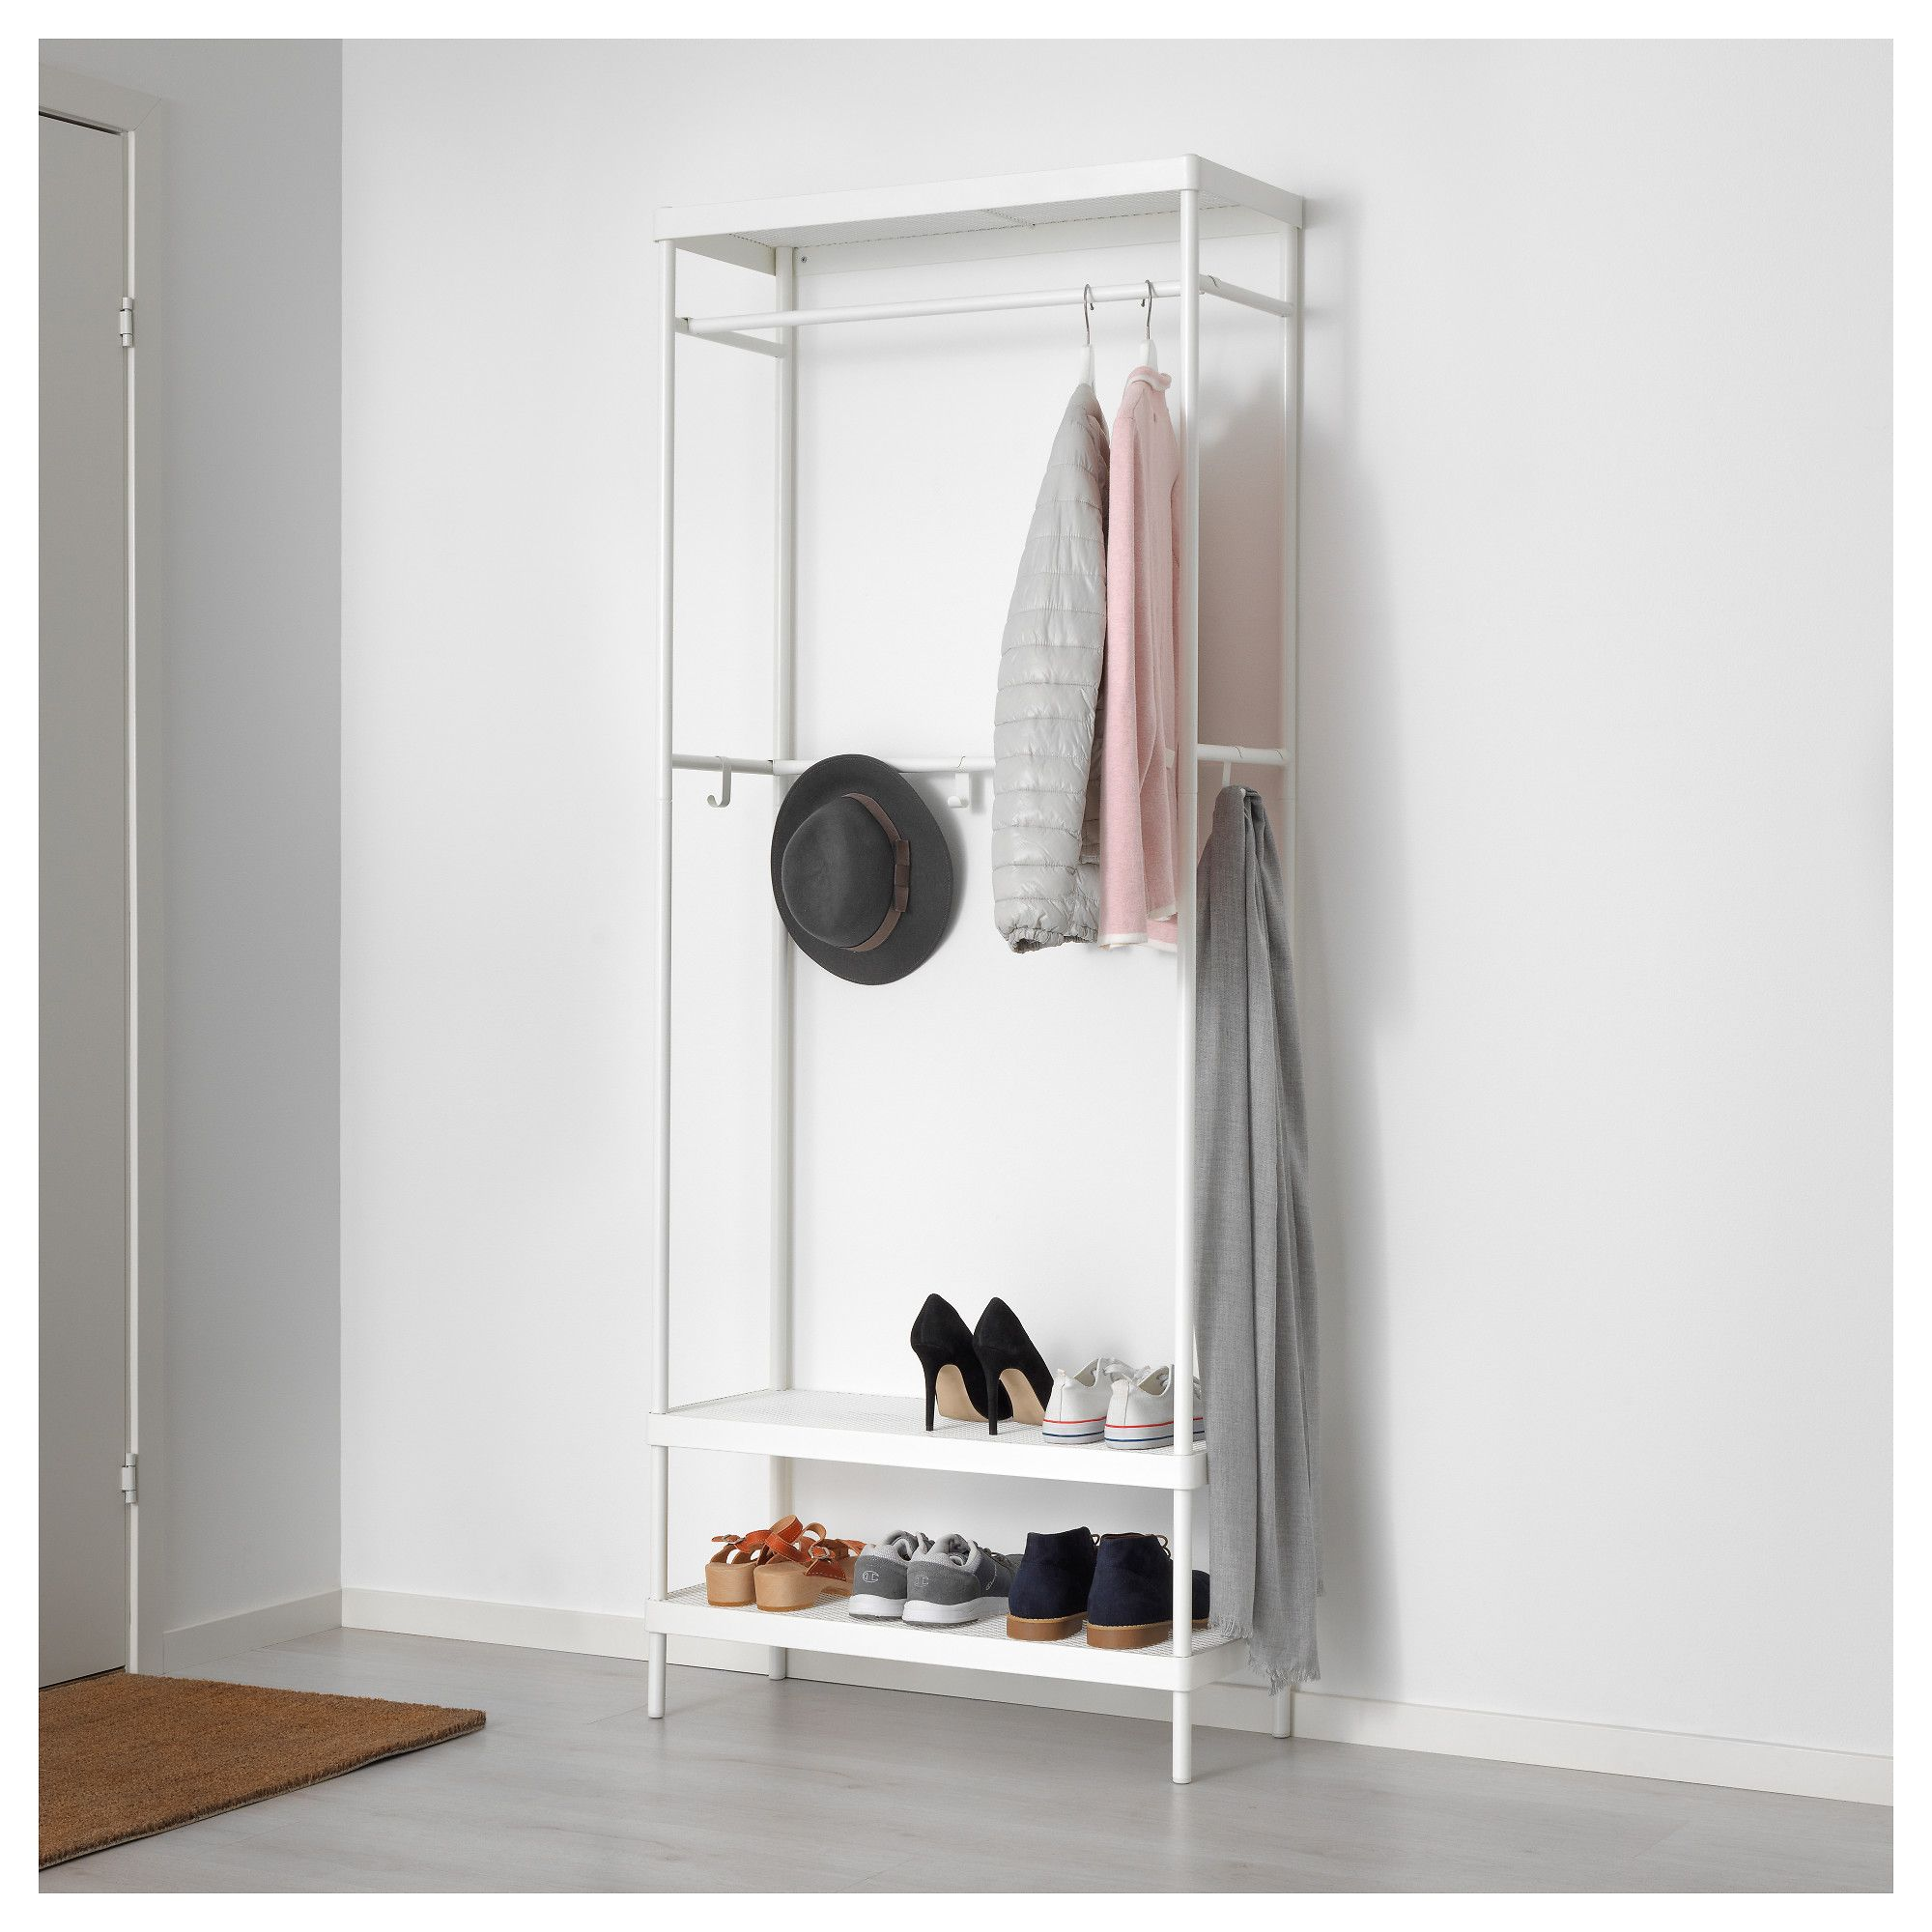 MACKAPÄR Coat rack with shoe storage unit 78x193 cm | Shoe storage ...